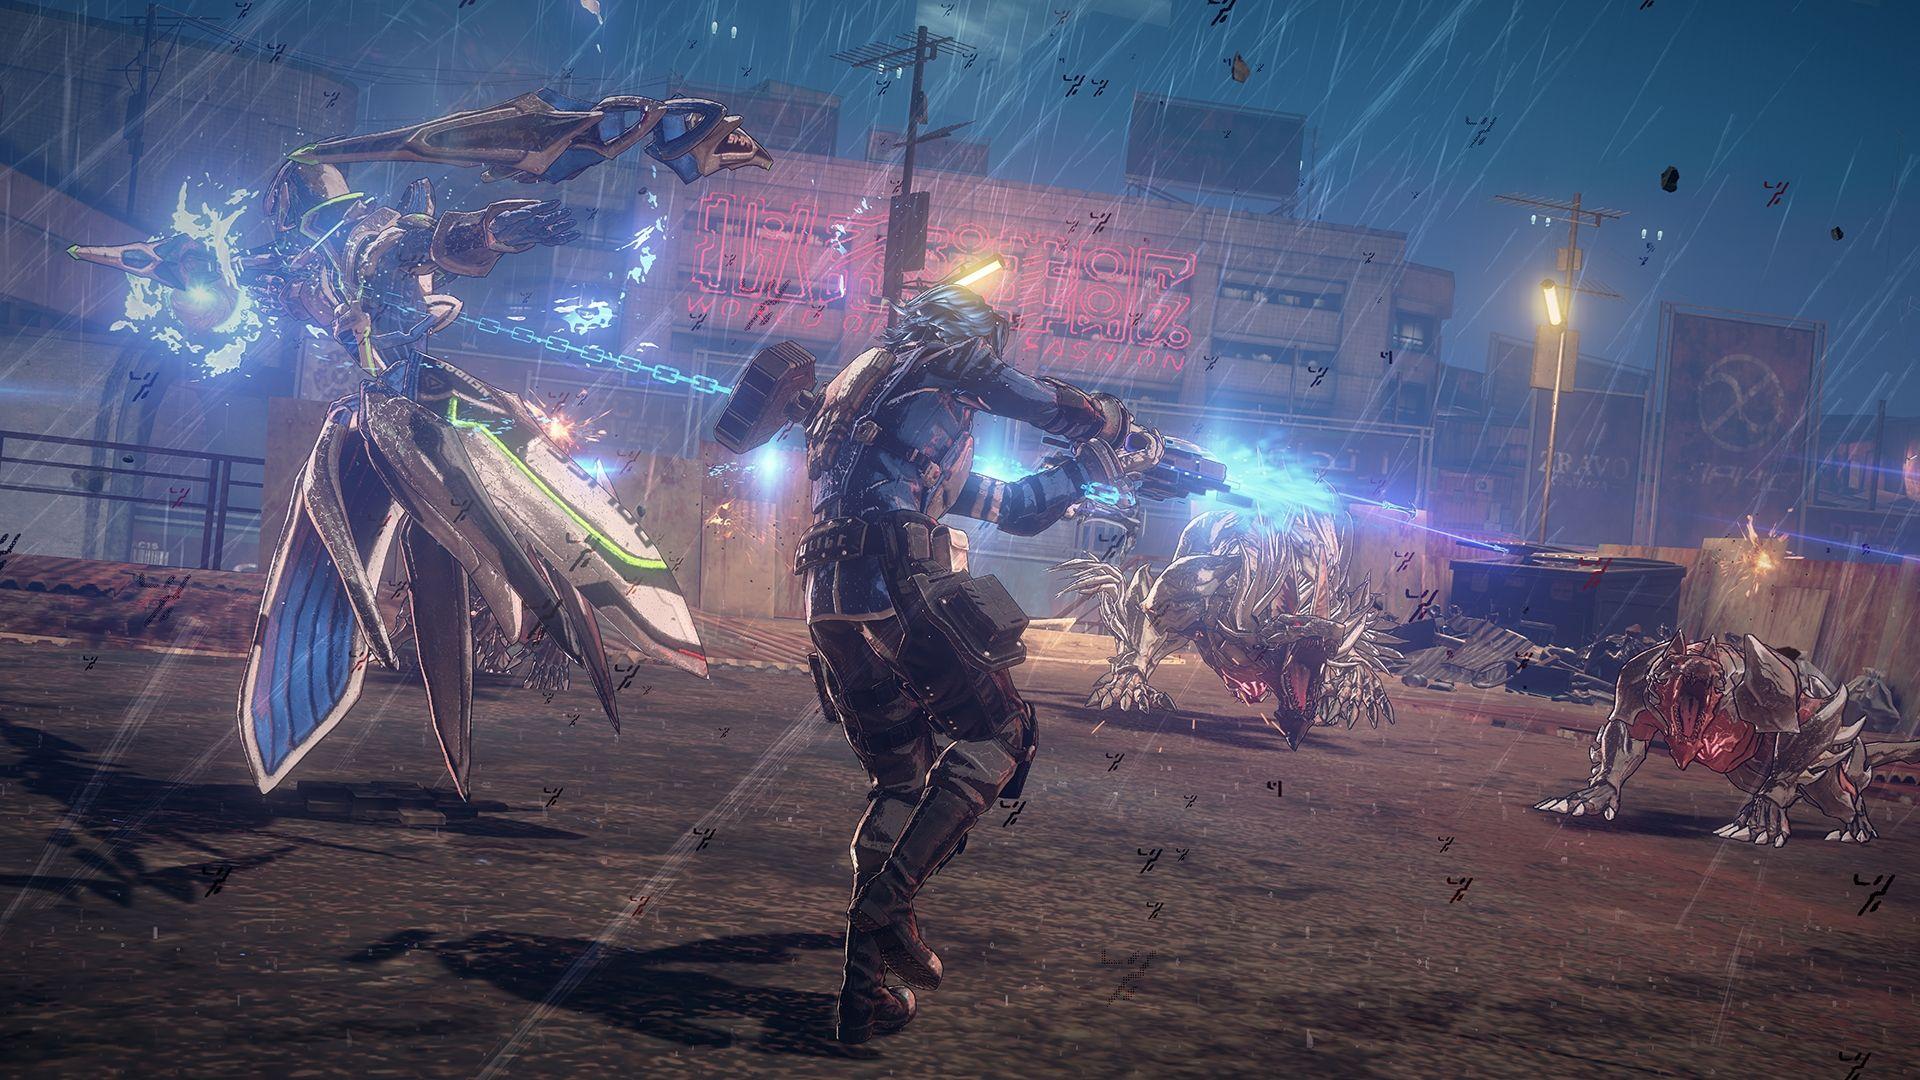 GGU Astral, Platinum games, Video game news